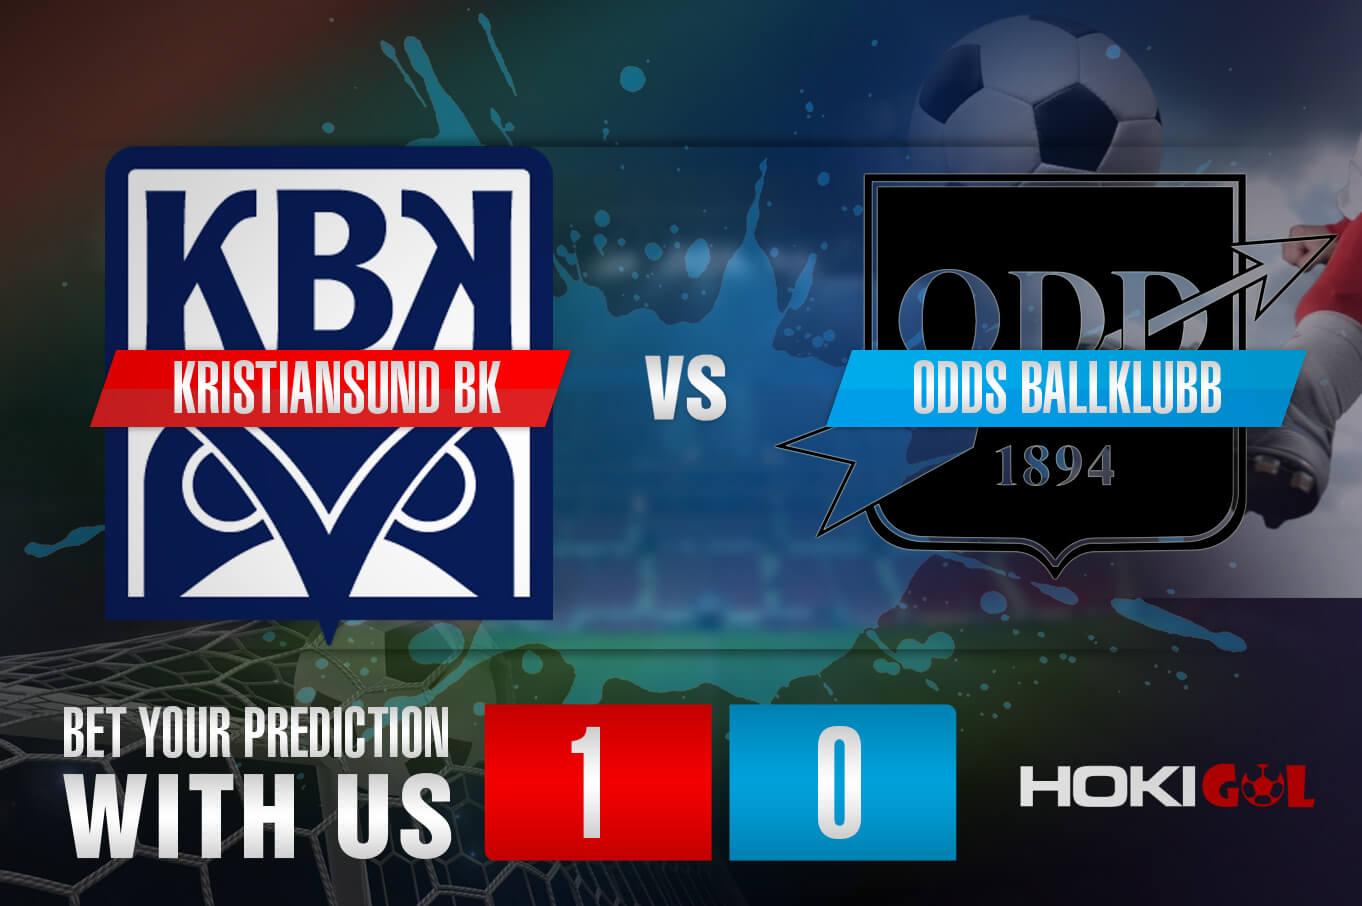 Prediksi Bola Kristiansund BK Vs Odds Ballklubb 12 Juni 2021